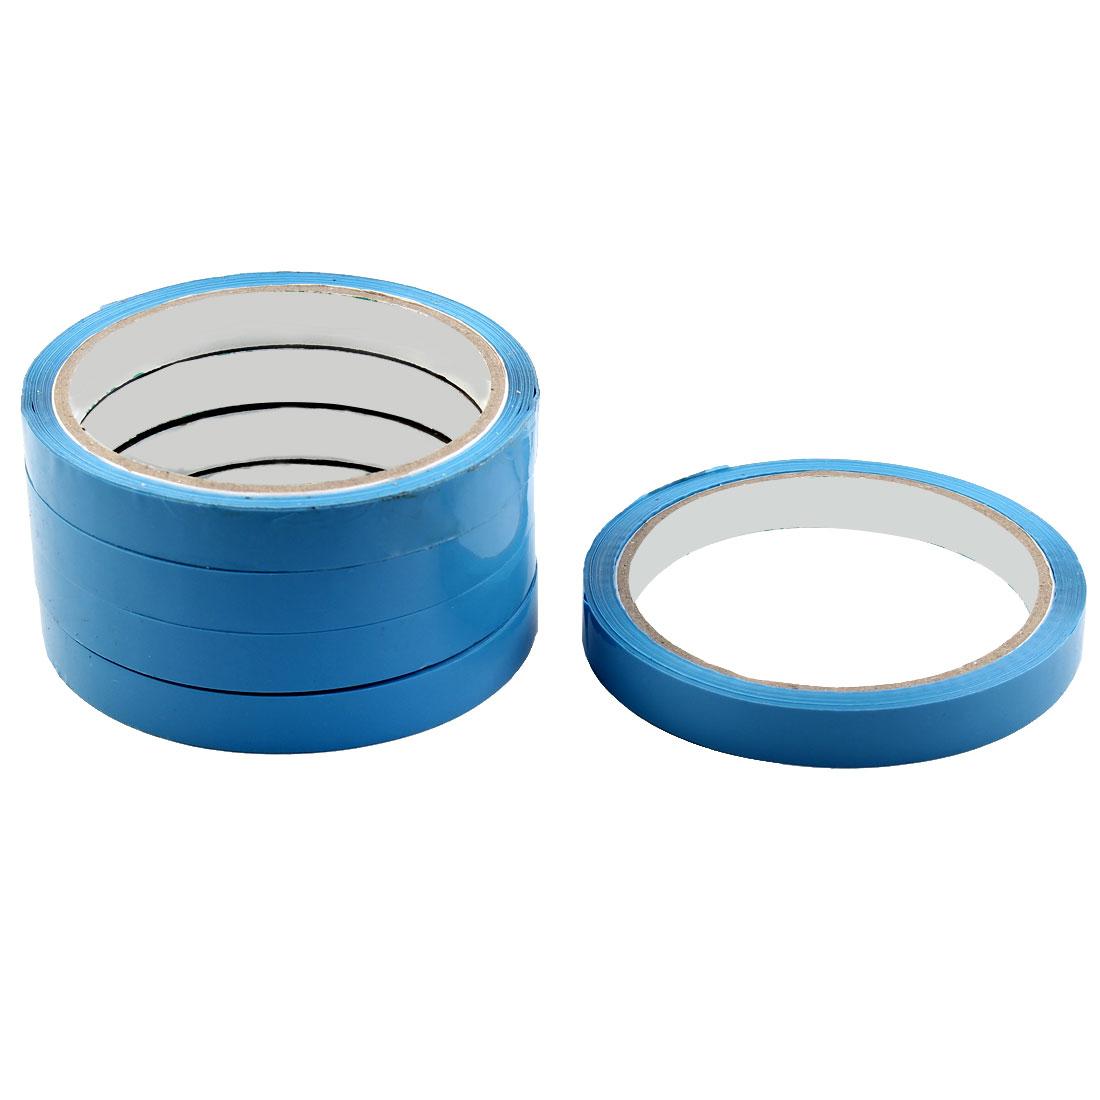 Supermarket PVC Vagetable Fruit Meat Sealing Adhesive Tape Blue 1.2cm Width 5pcs